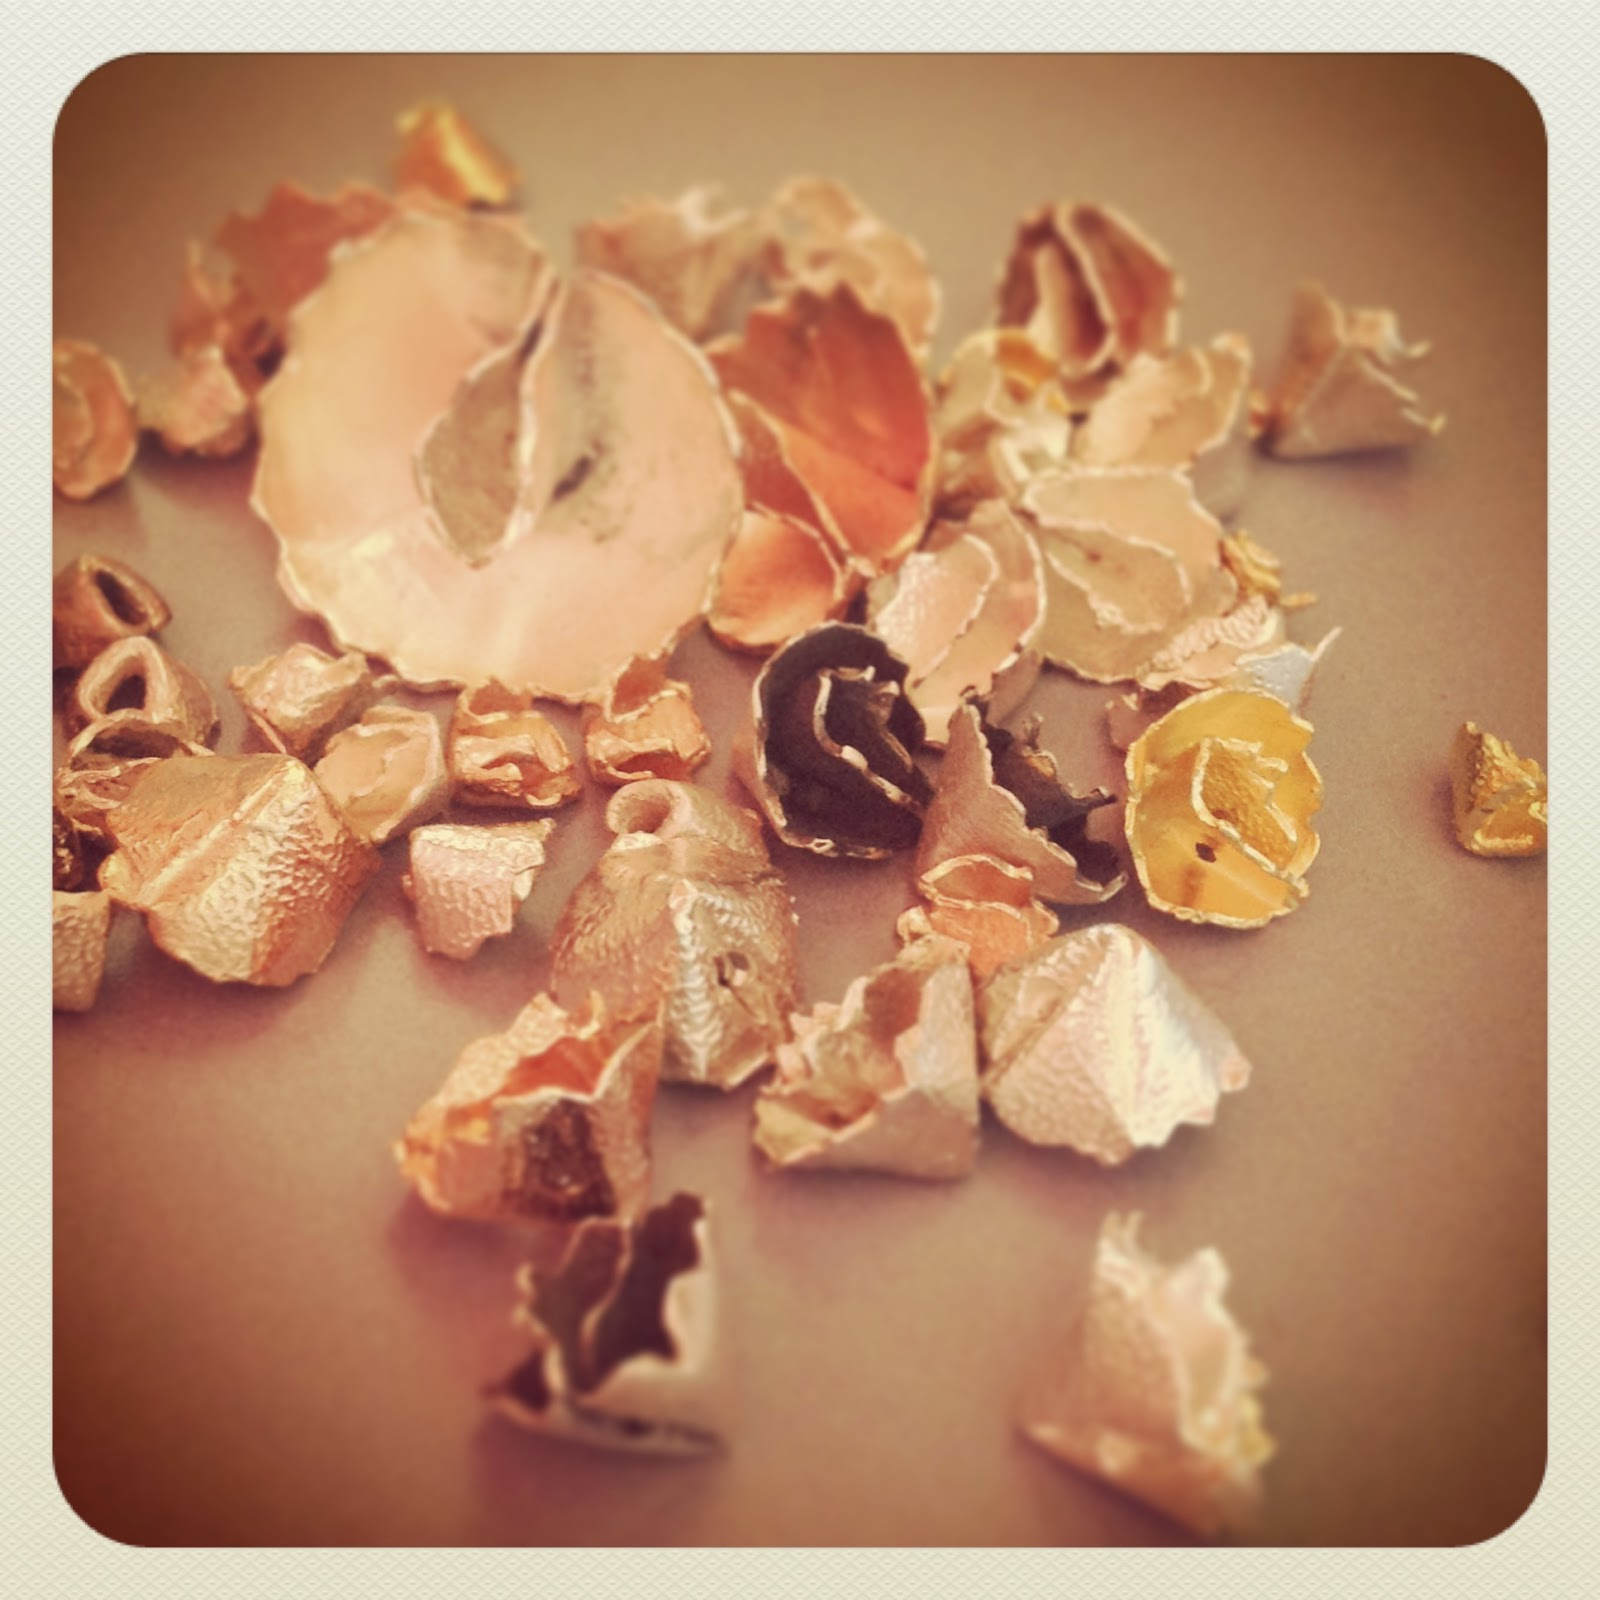 piezas al dente joyas de plata stimuls